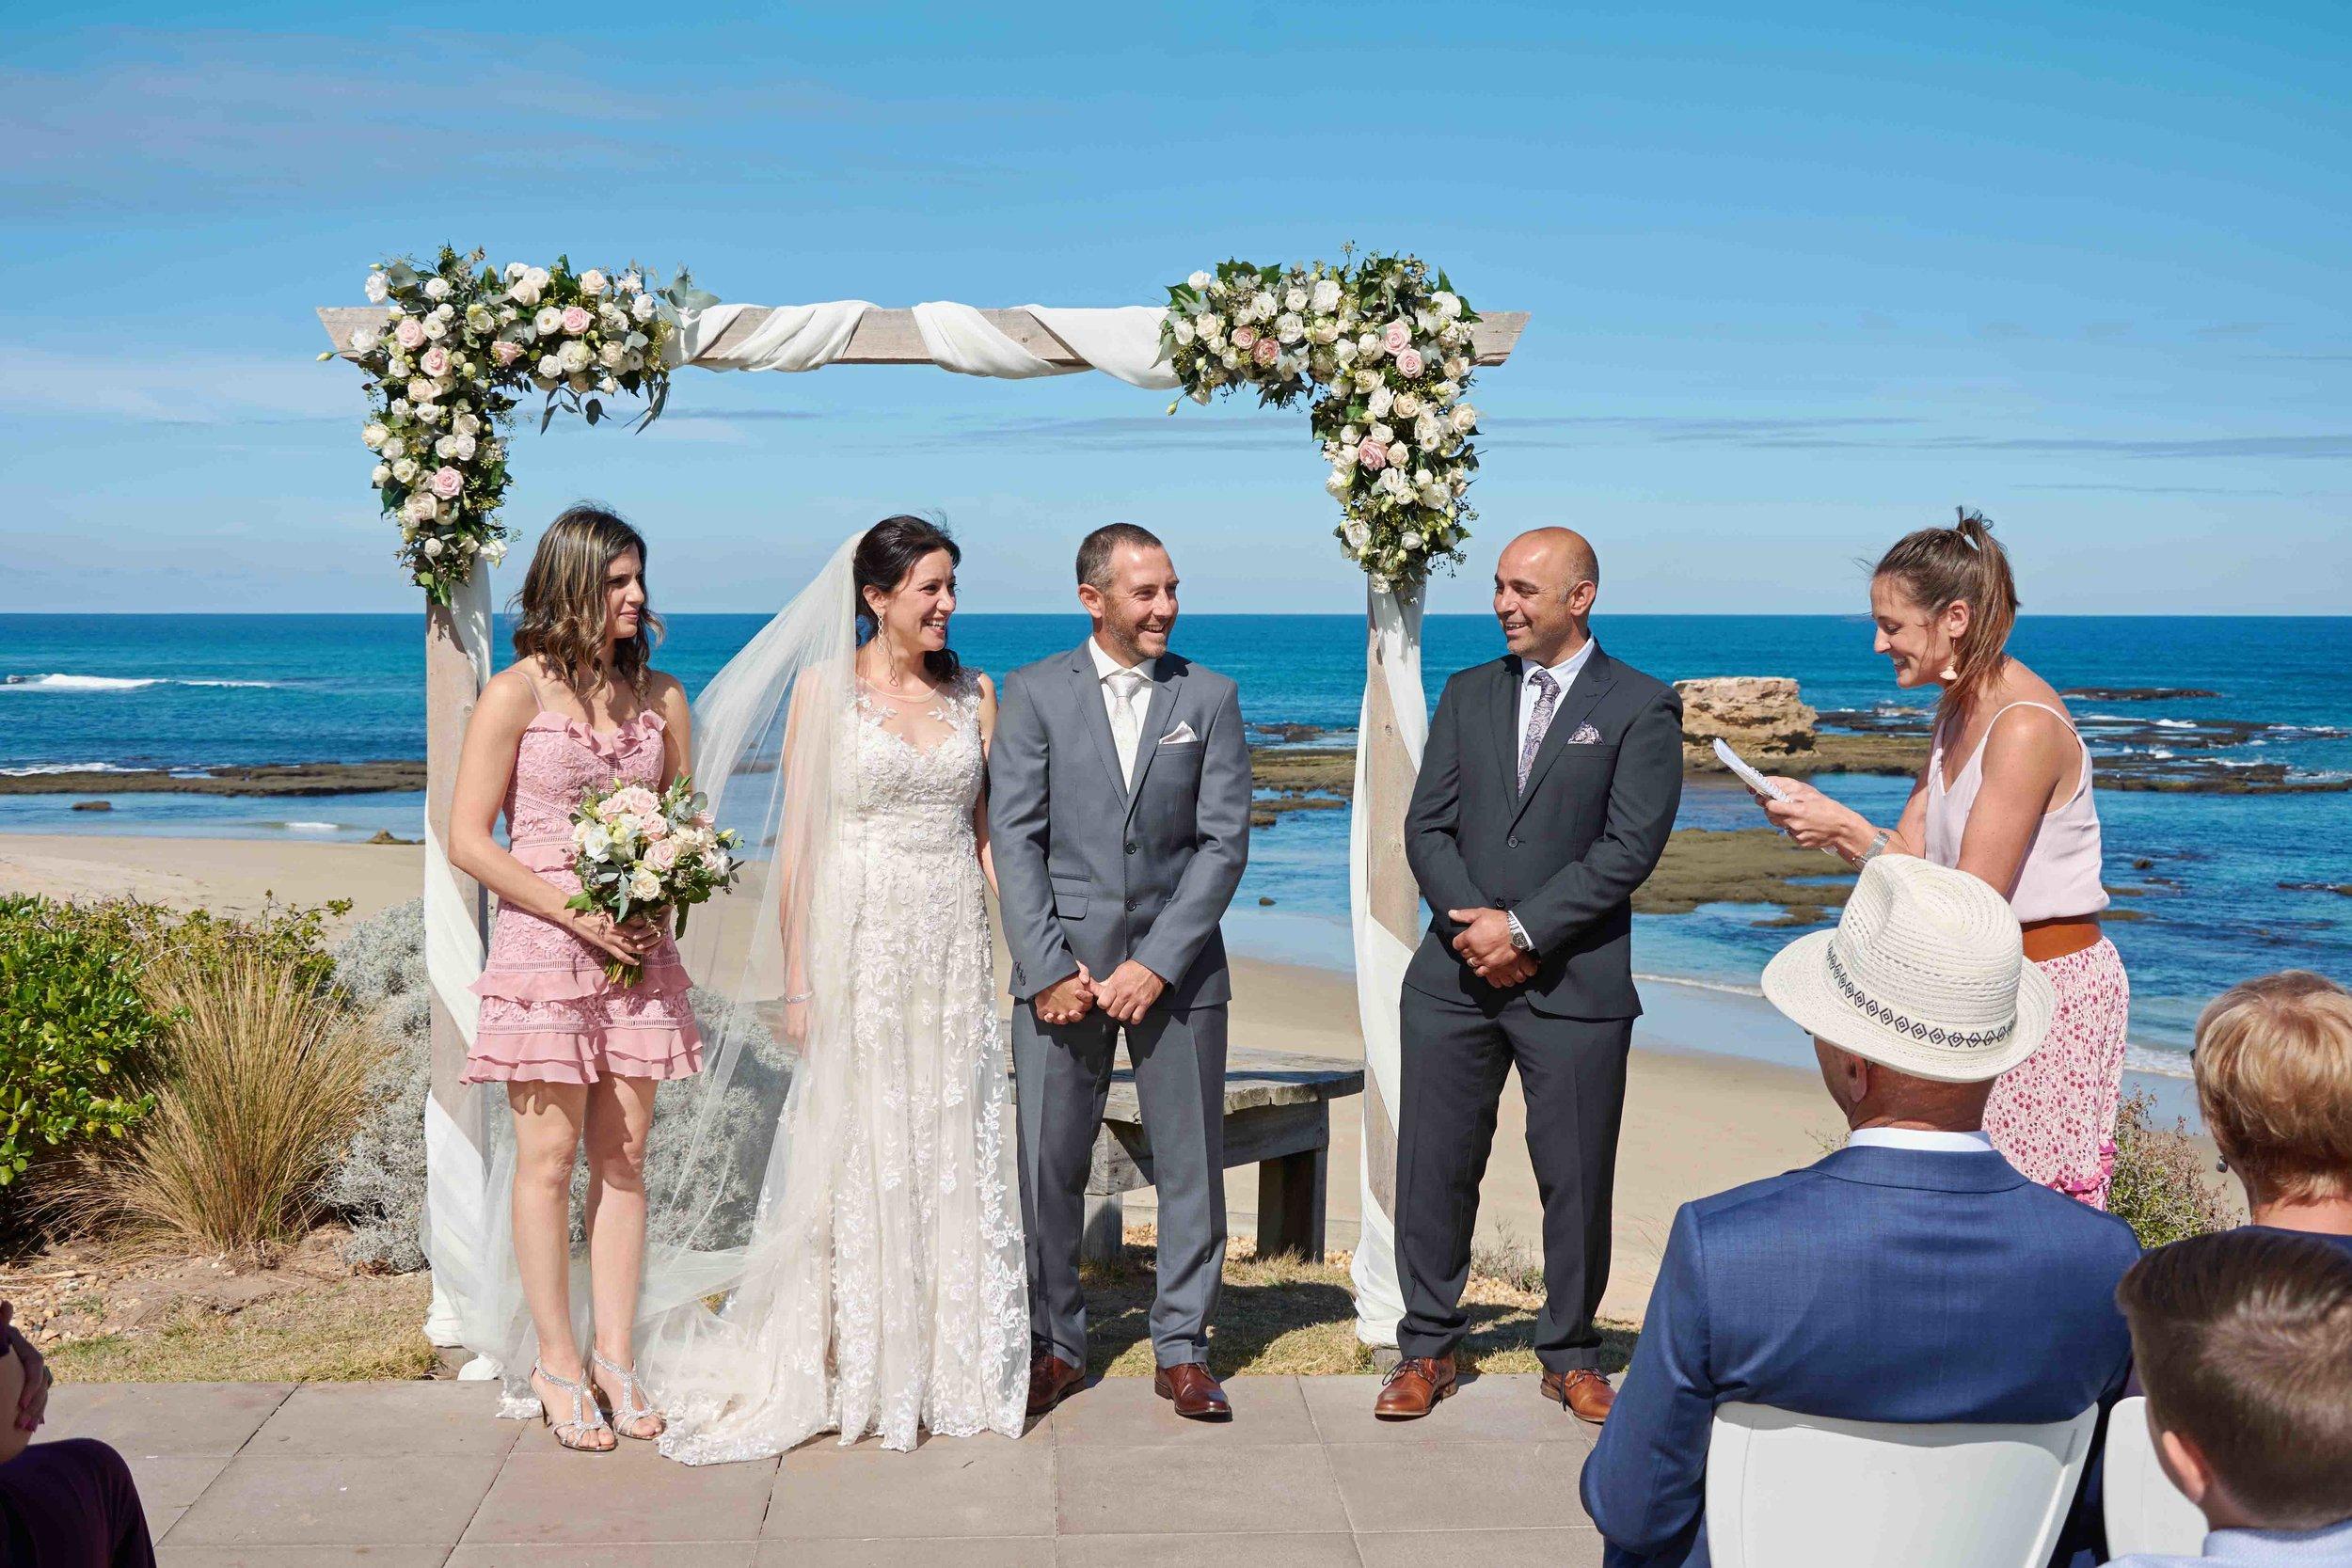 sorrento-wedding-photography-all-smiles-marissa-jade-photography-43.jpg